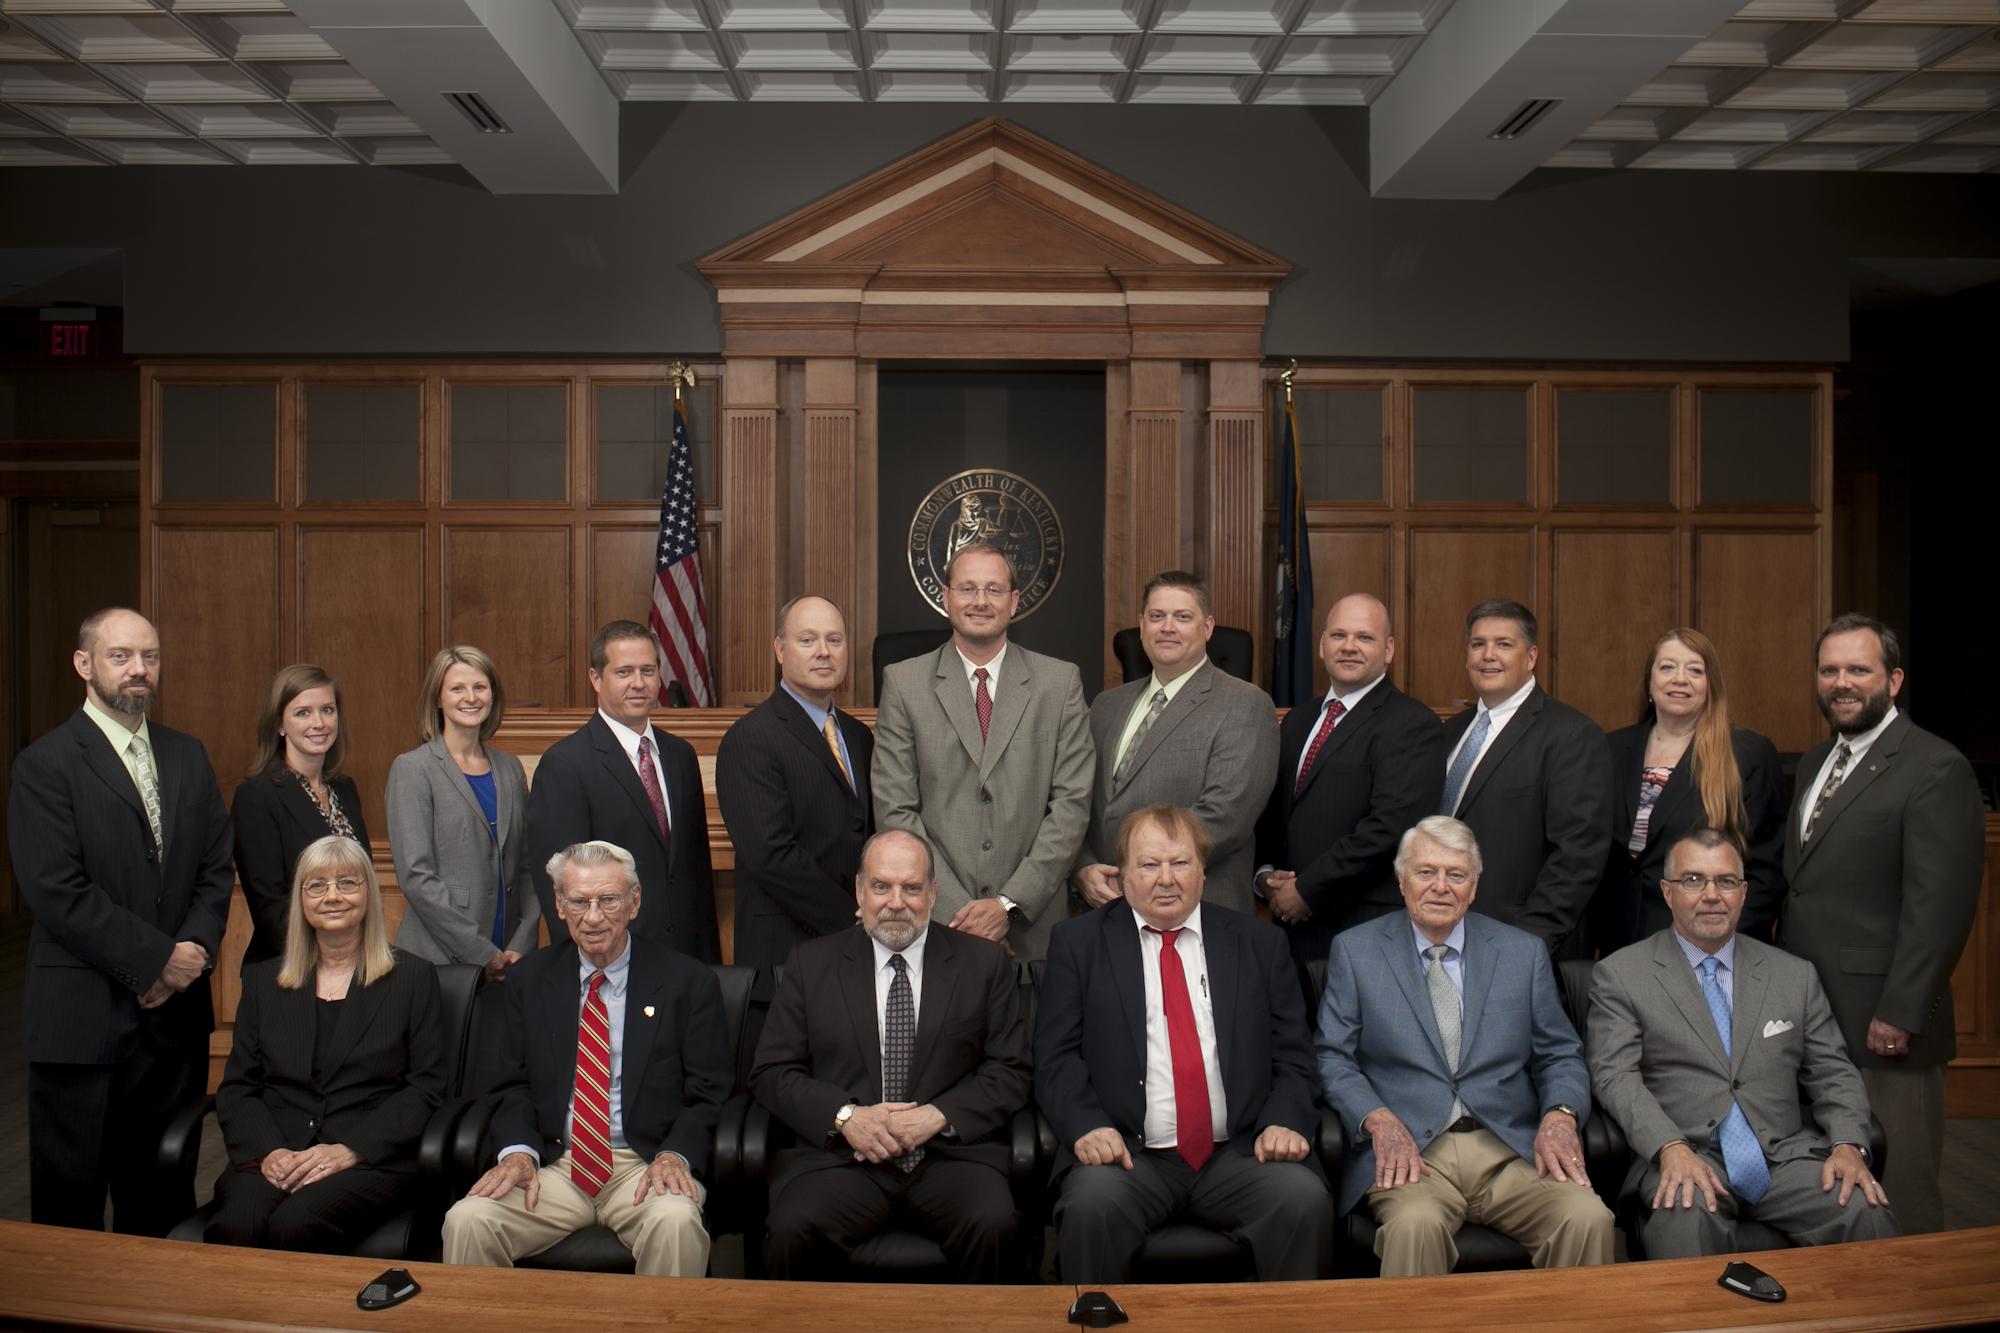 2013.07.17_ todd county lawyers _lemon-5.jpg